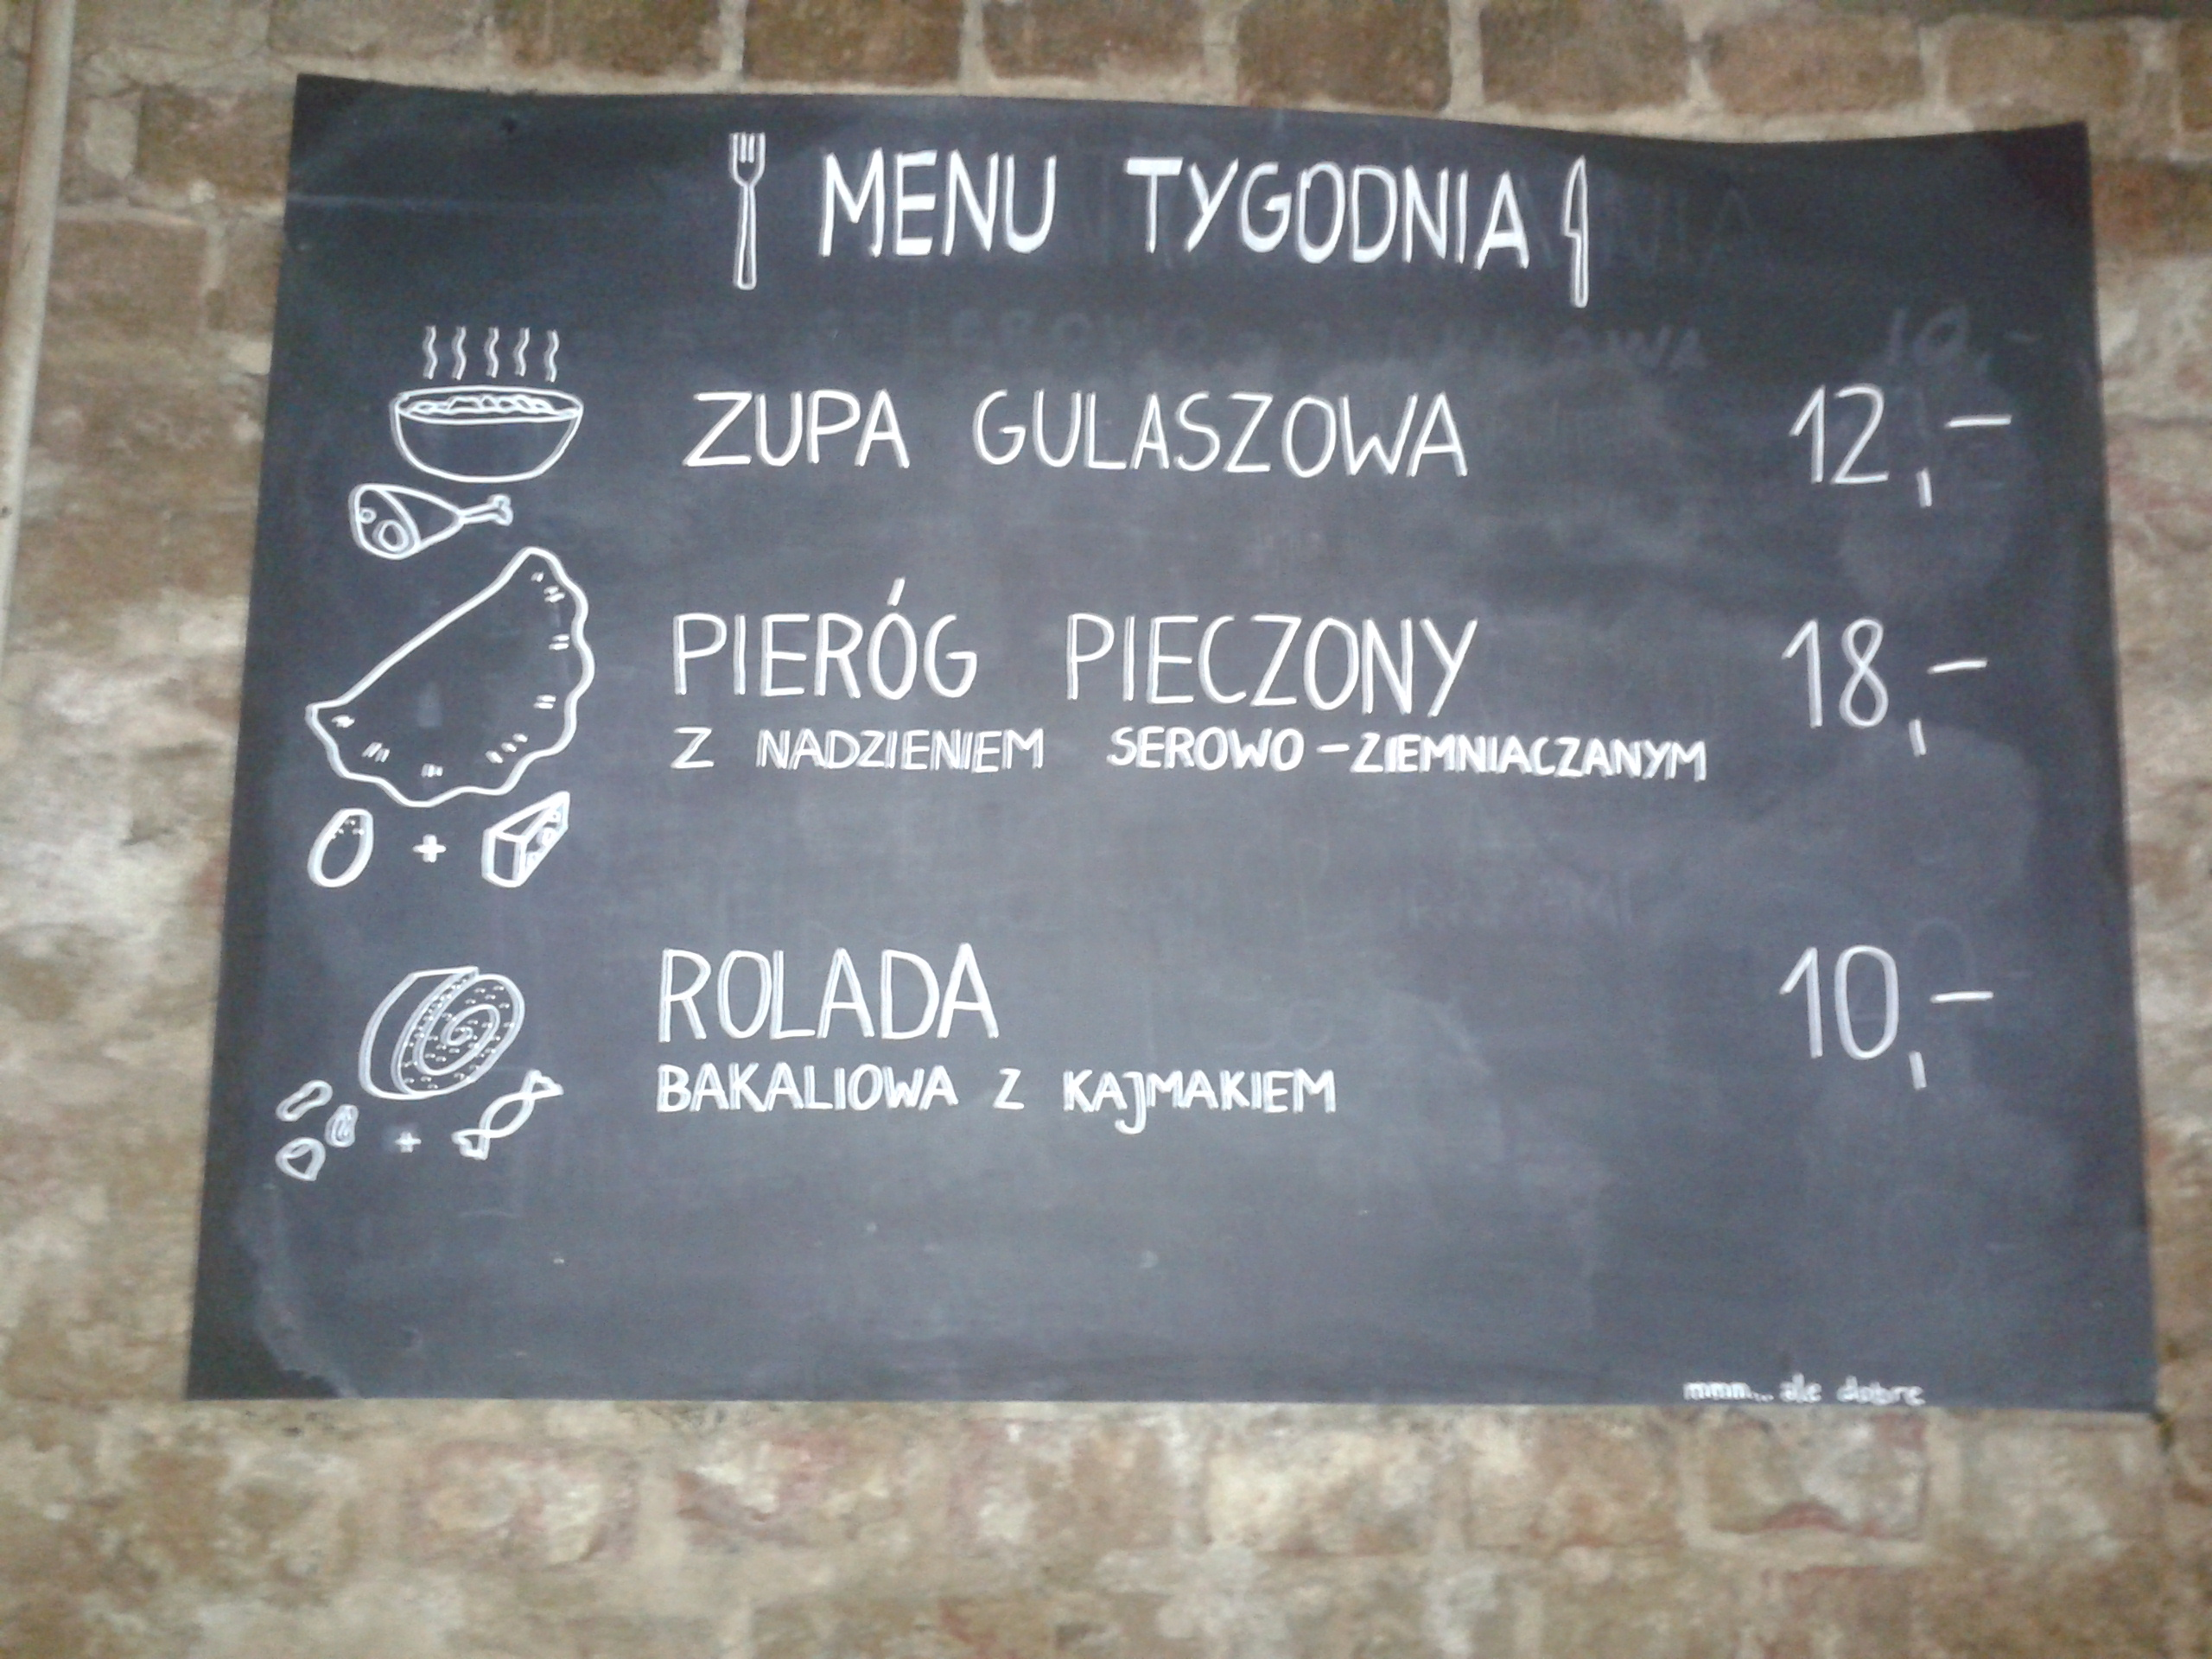 http://streetfoodpolska.pl/web/wp-content/uploads/2014/01/41.jpg